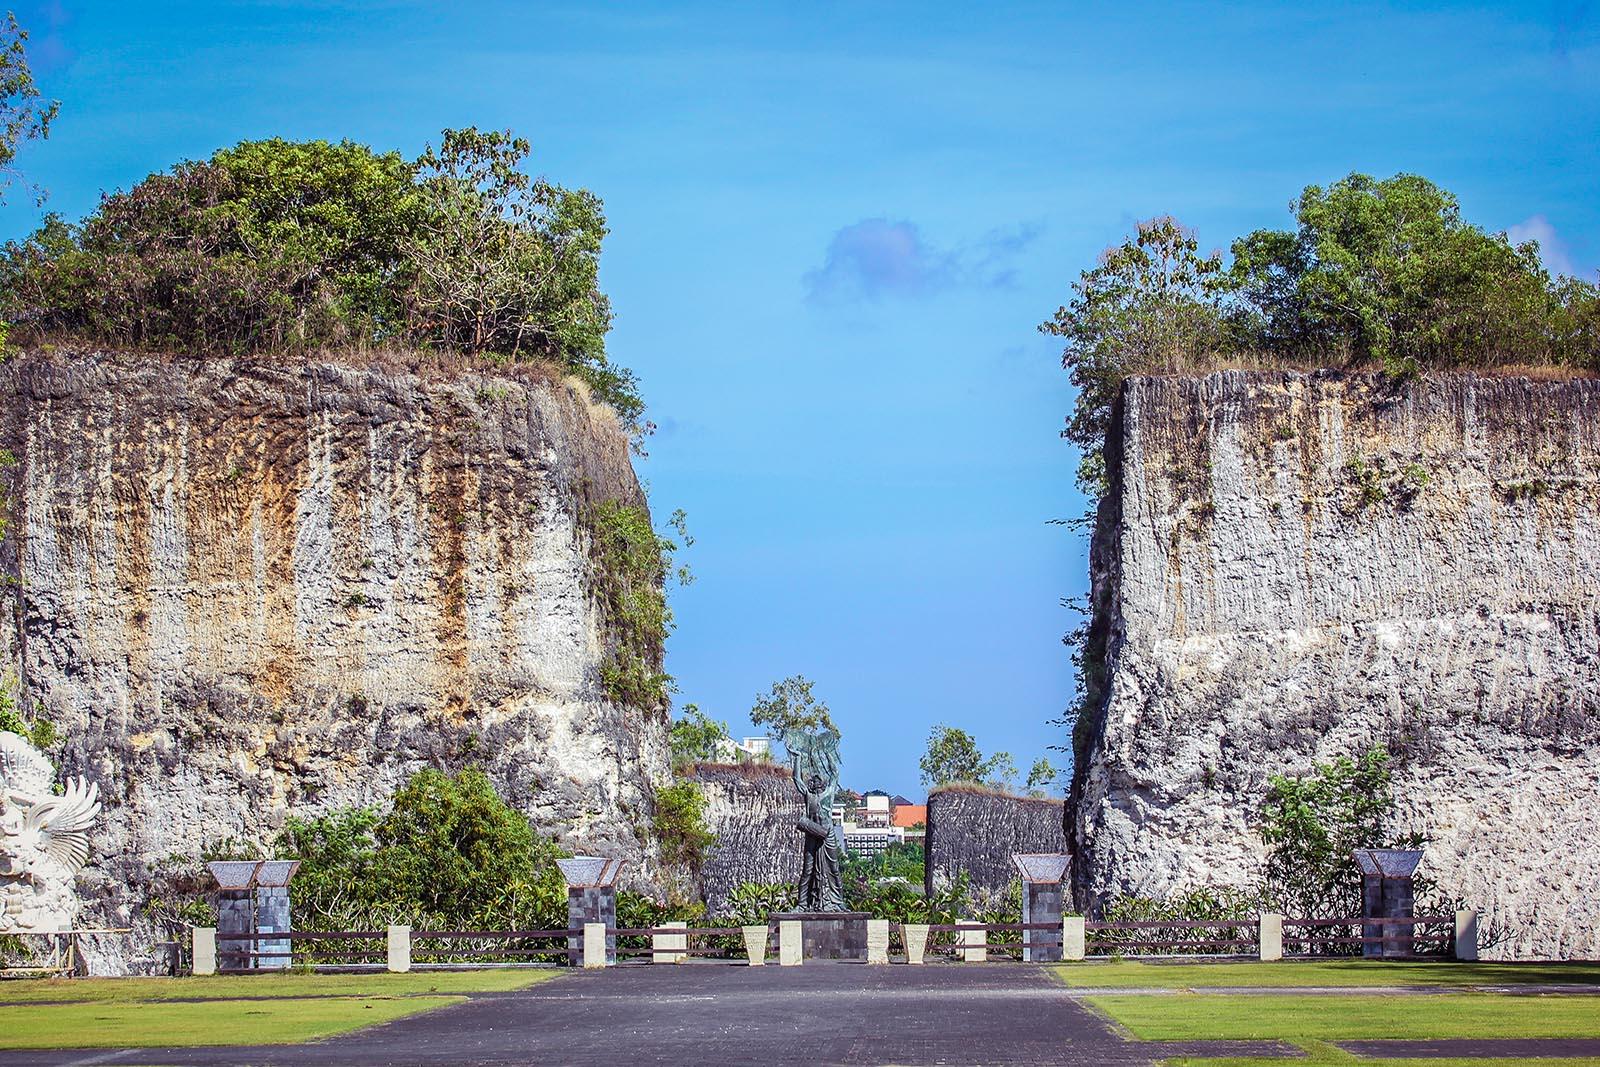 Garudha Wisnu Kencana Cliff Bali